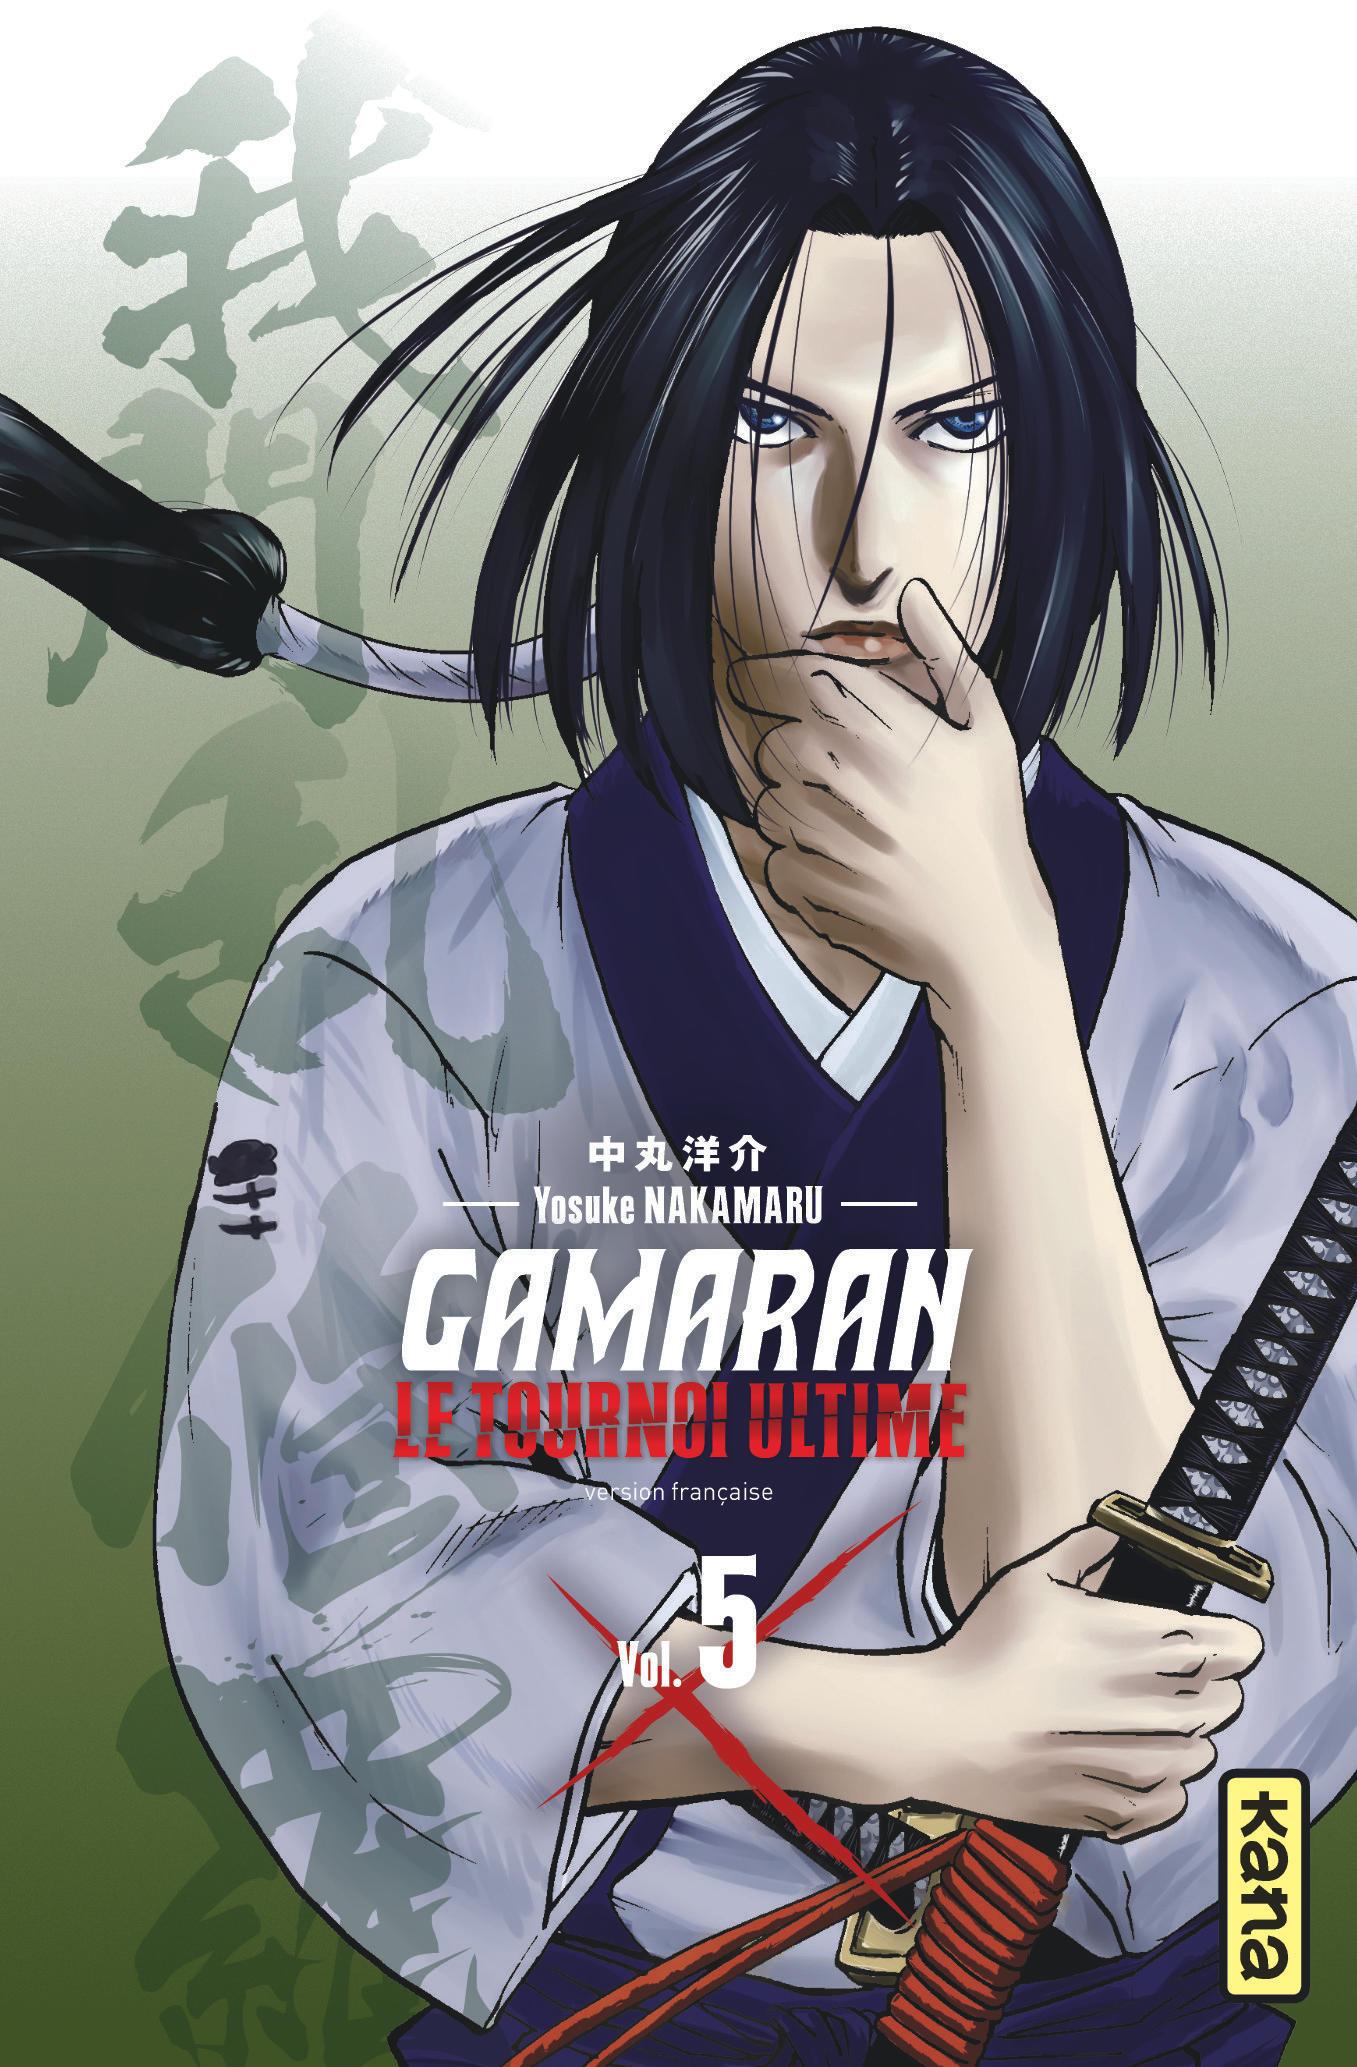 Gamaran - Le tournoi ultime 5